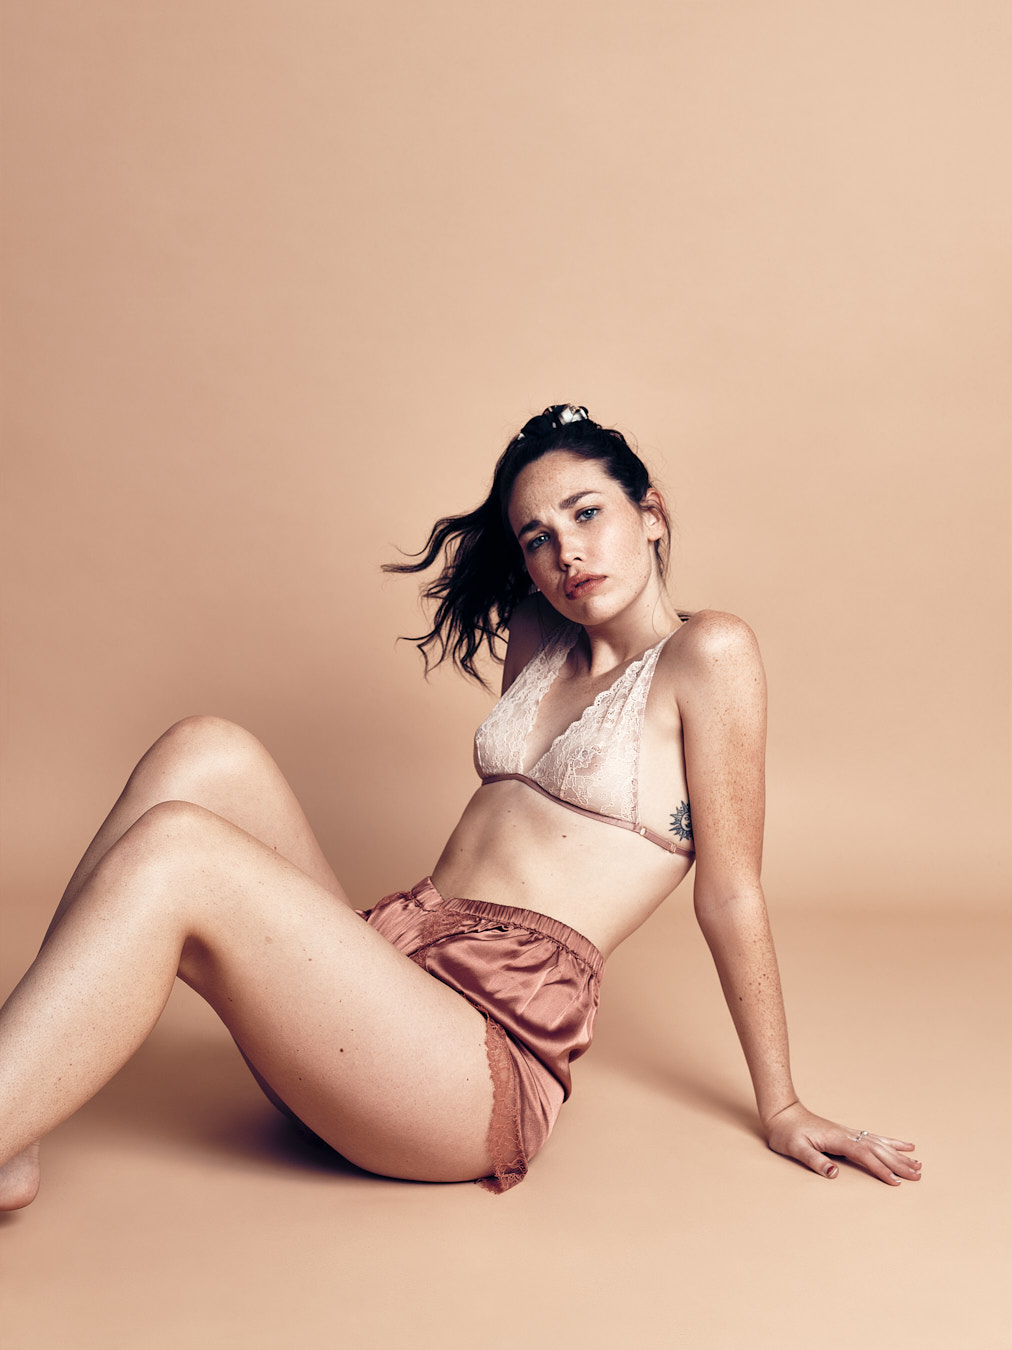 Verena altenberger bikini